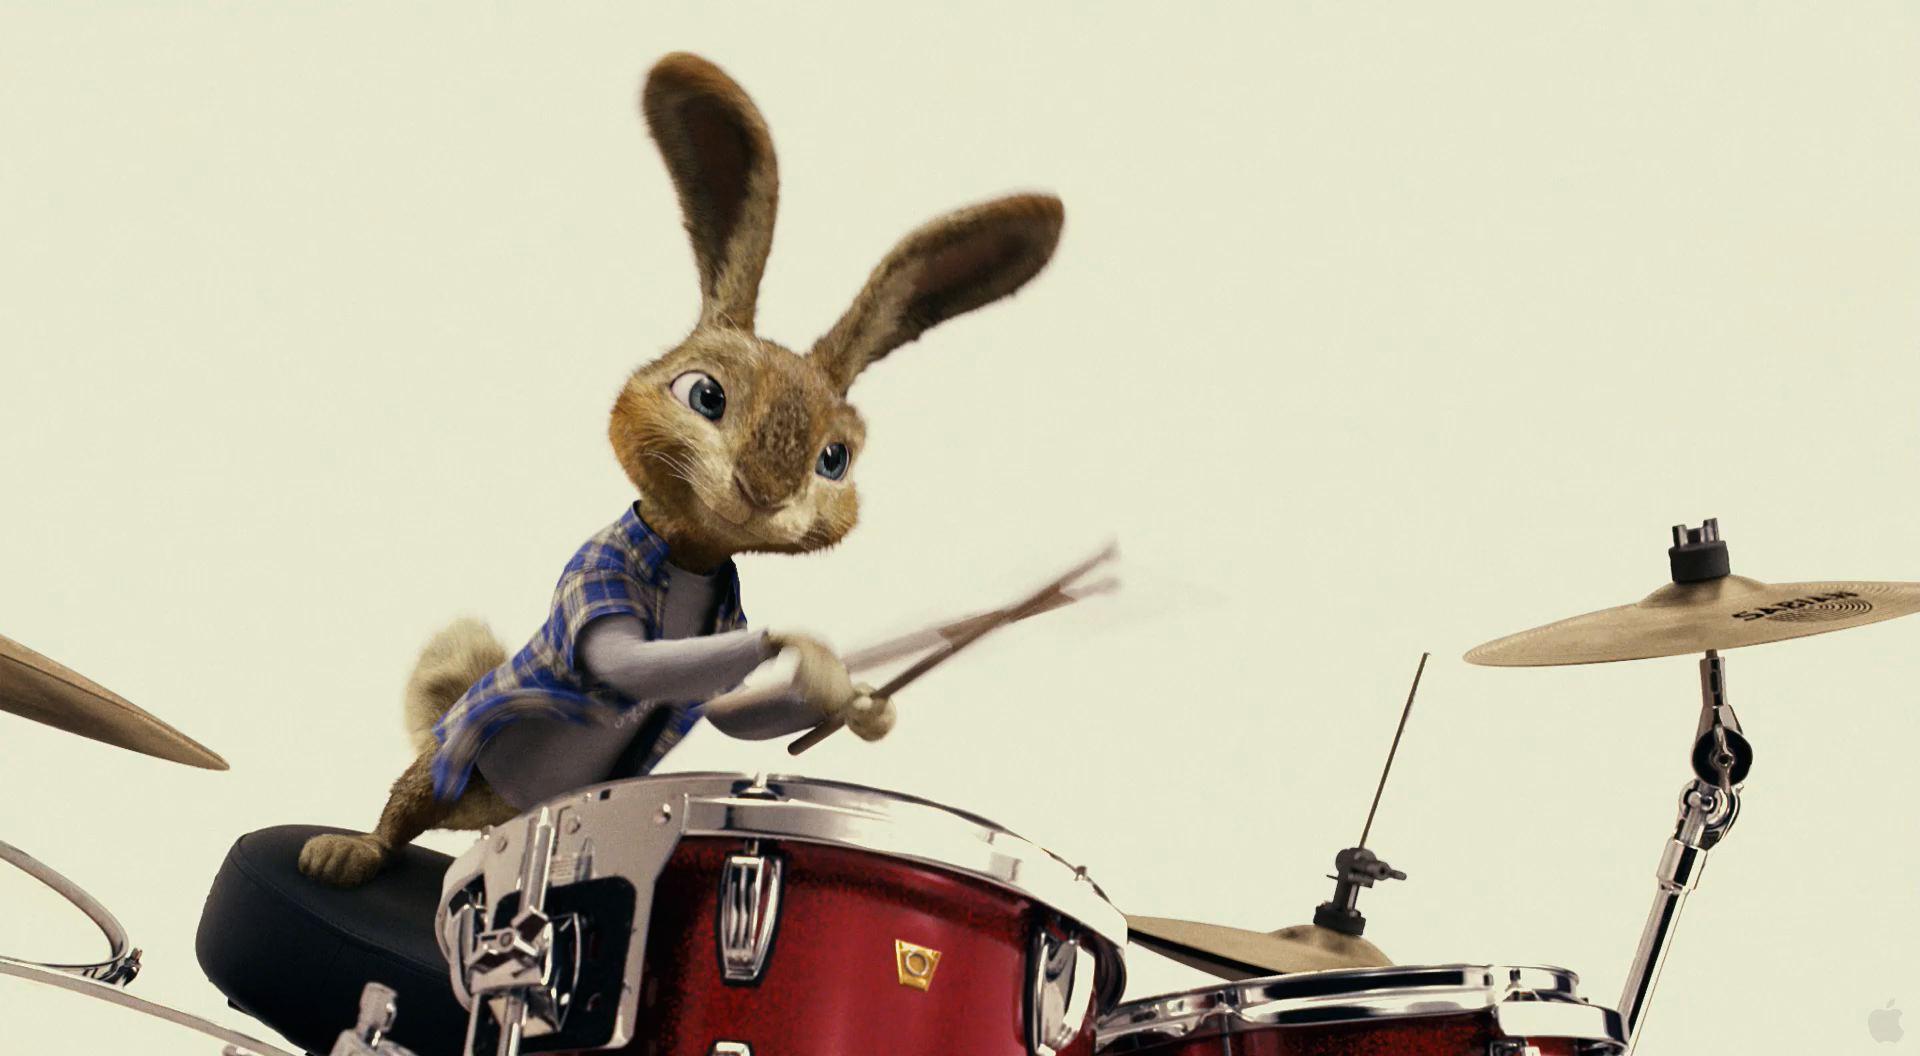 Easter Bunny 3D Wallpaper Backgrounds